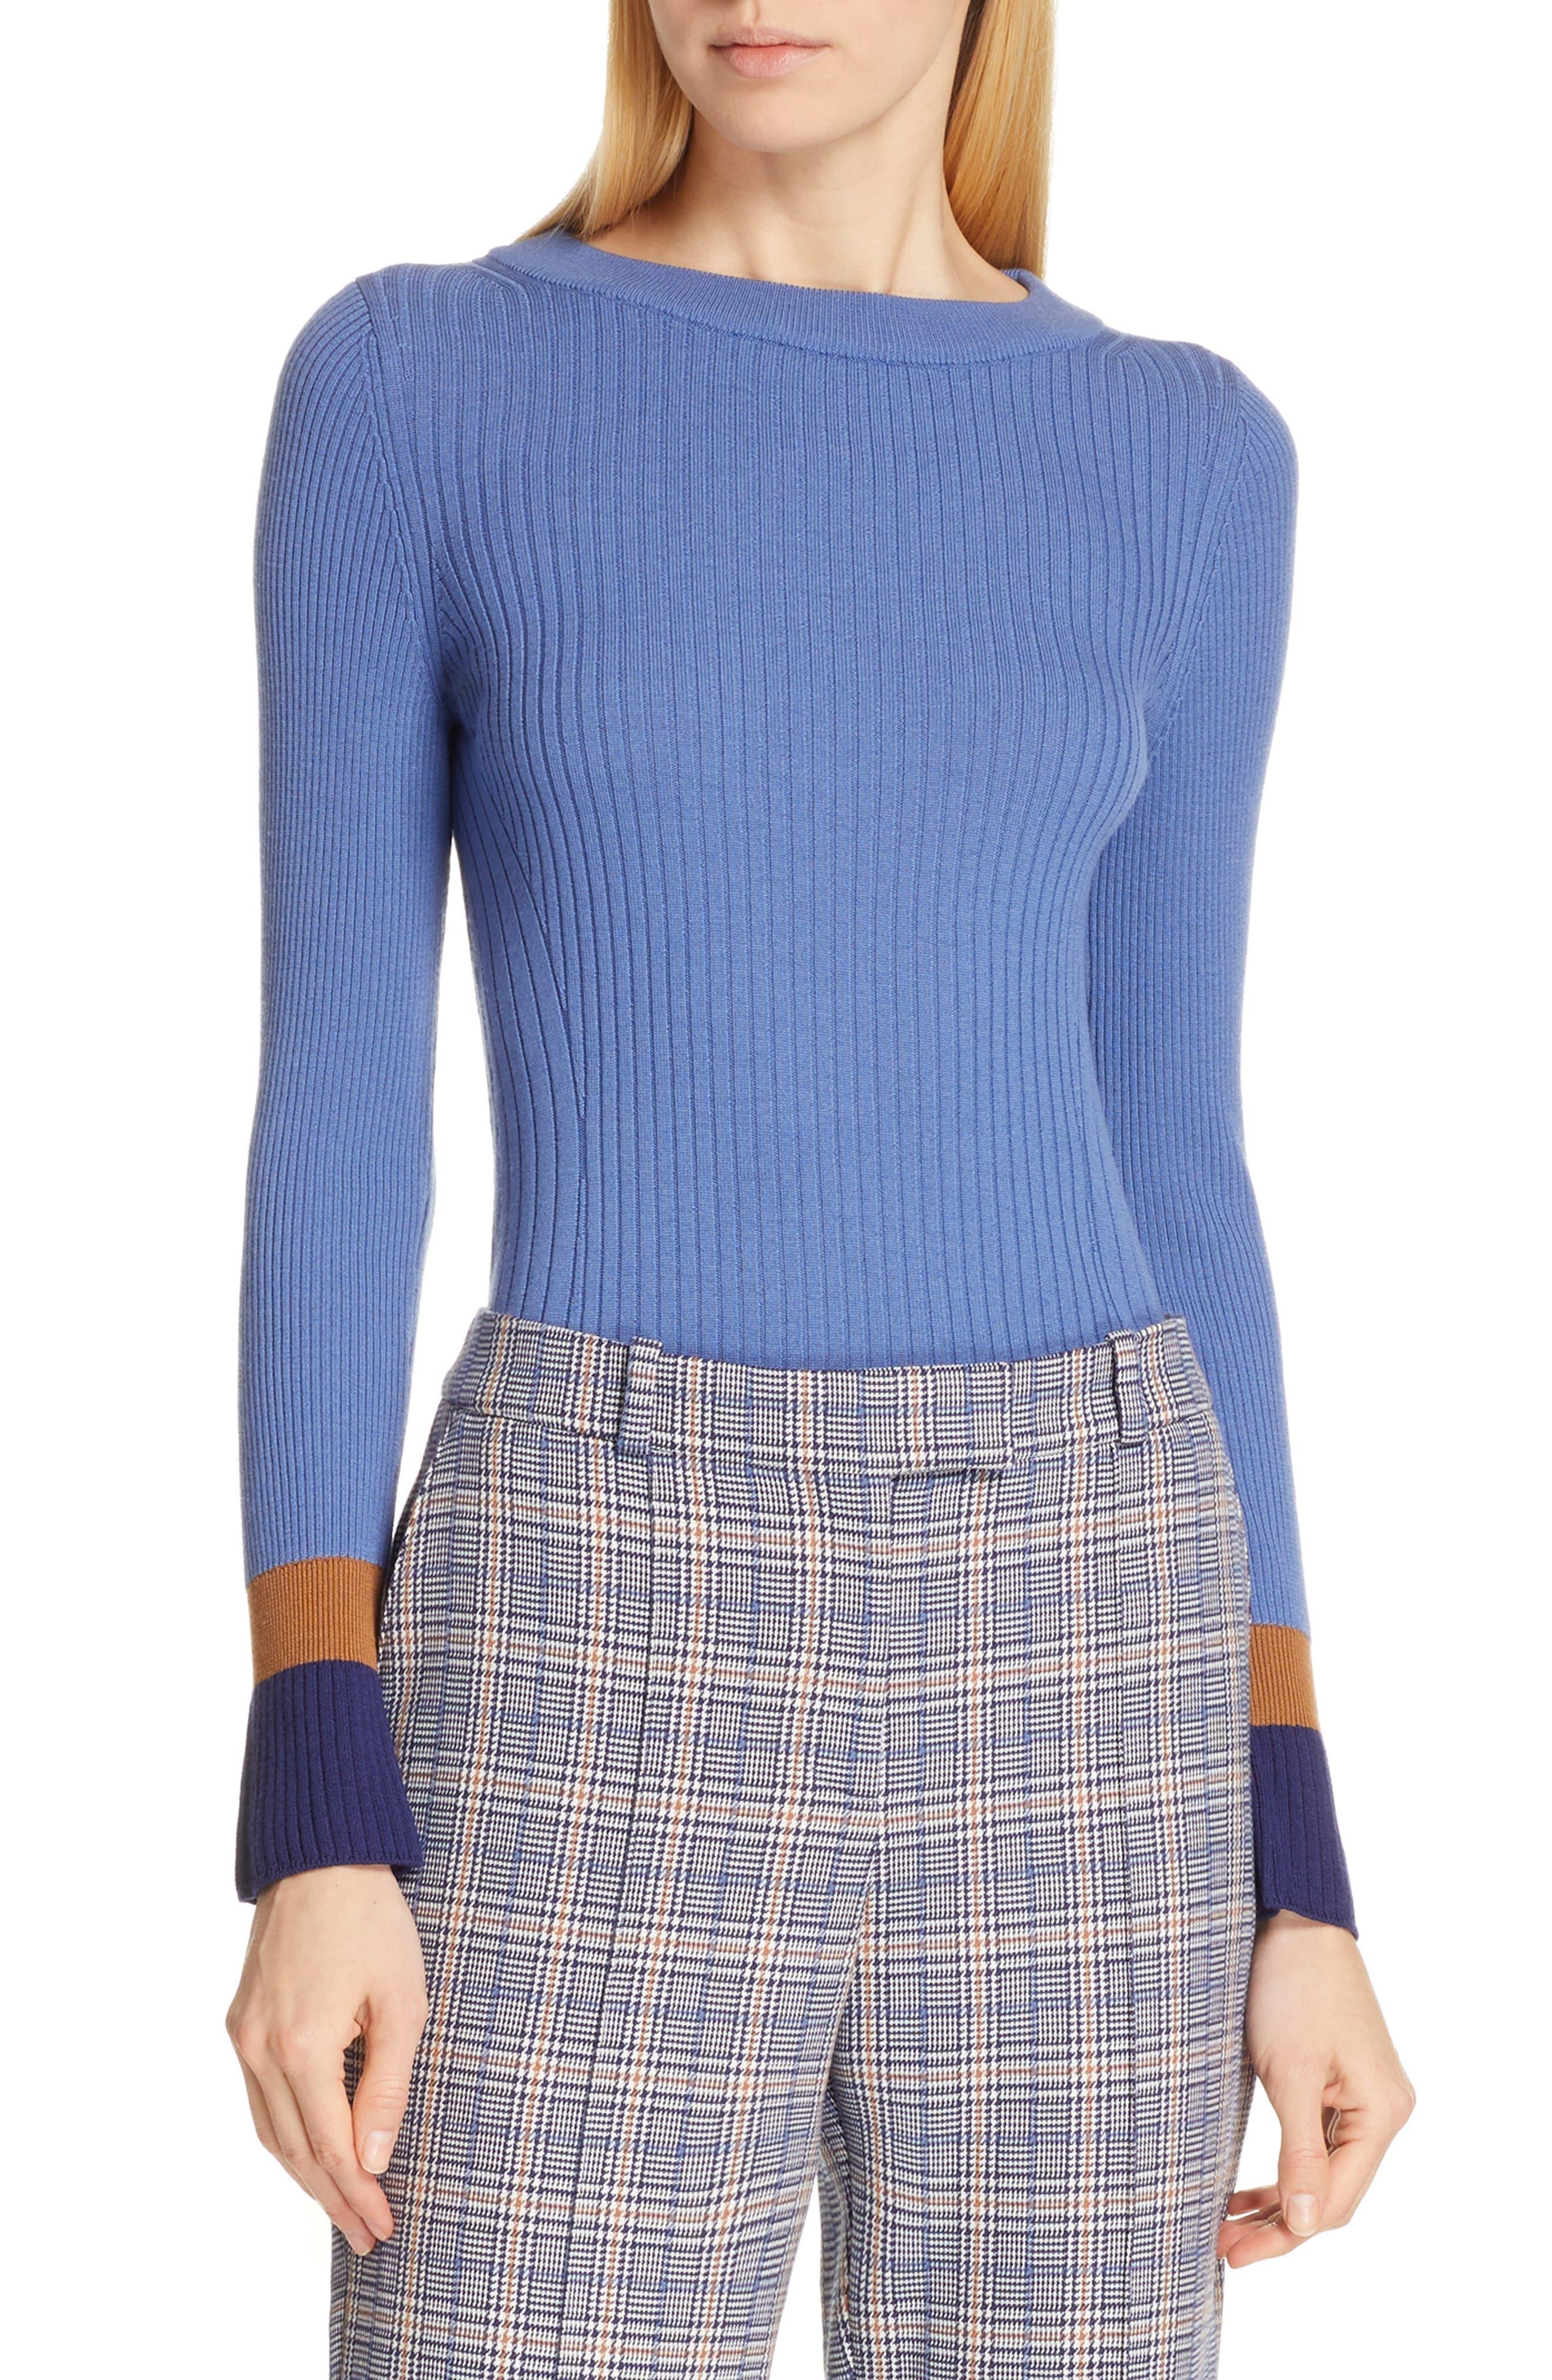 Fadeline Blue Fantasy Ribbed Wool Sweater,                             Main thumbnail 1, color,                             SOFT BLUE FANTASY